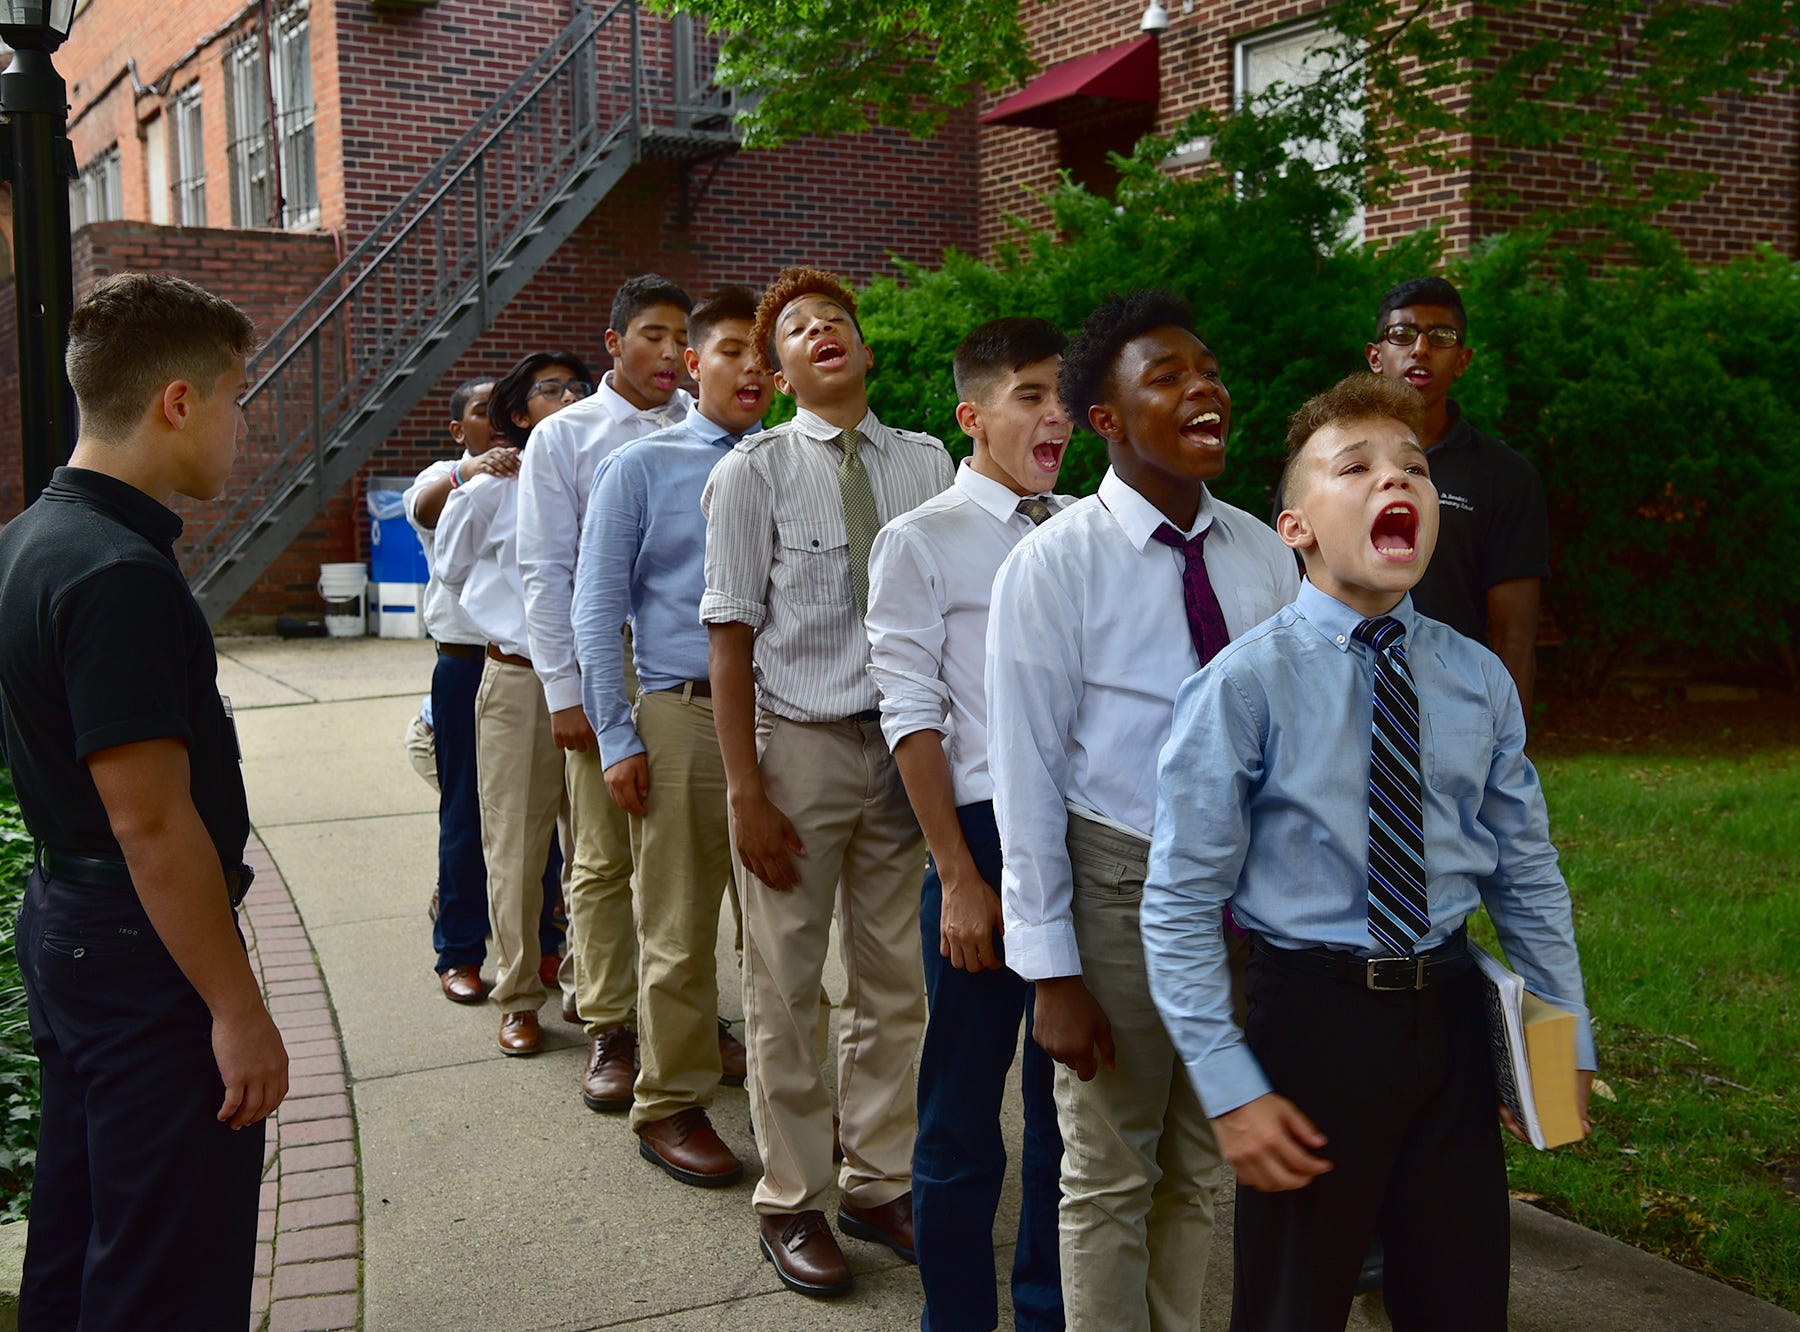 EDUCATION Naval Academy leadership program at St. Benedict's Prep School in Newark, NJ.